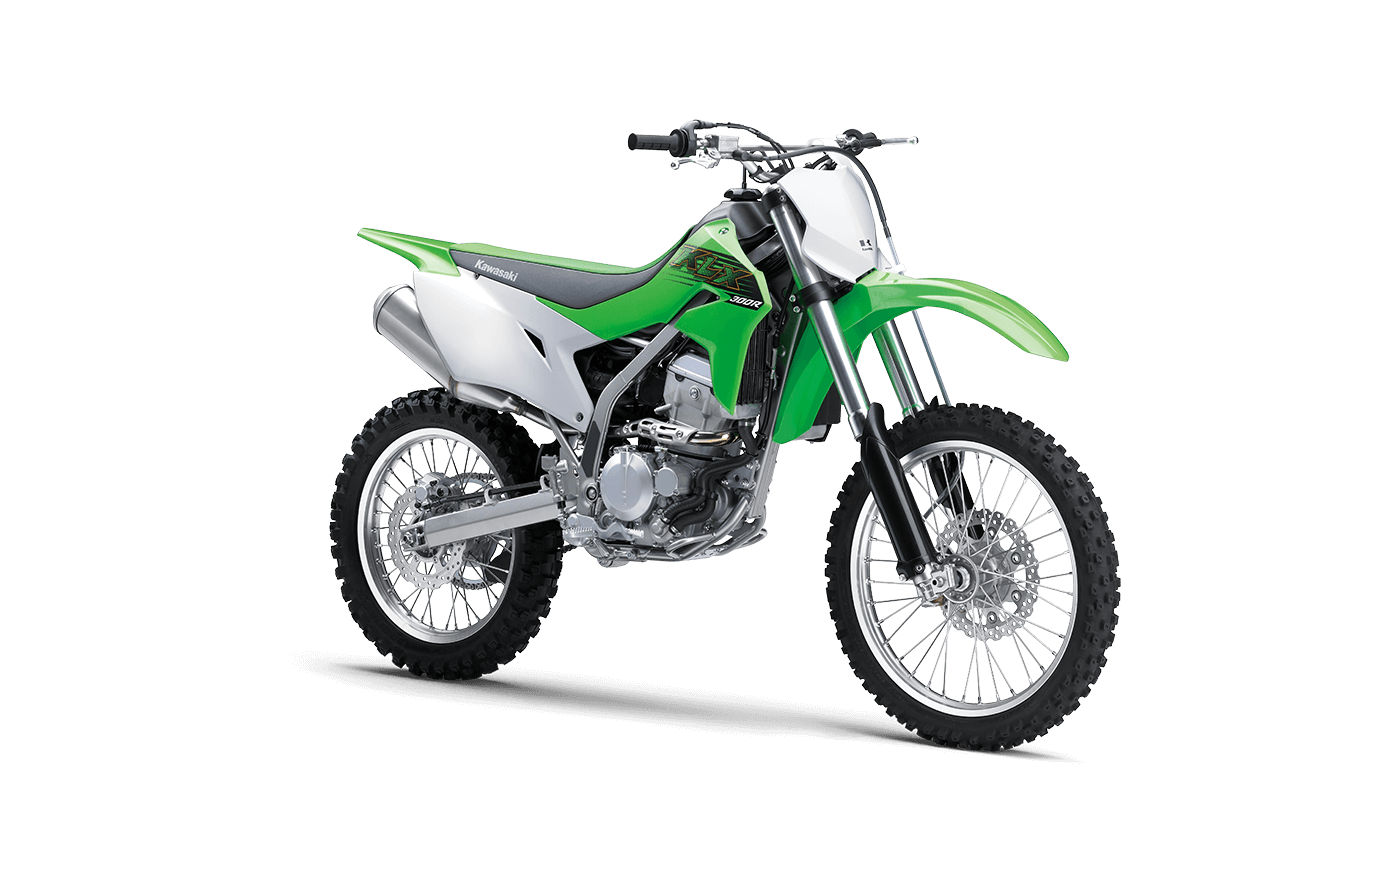 Klx 300r Klr Klx Motorcycle By Kawasaki